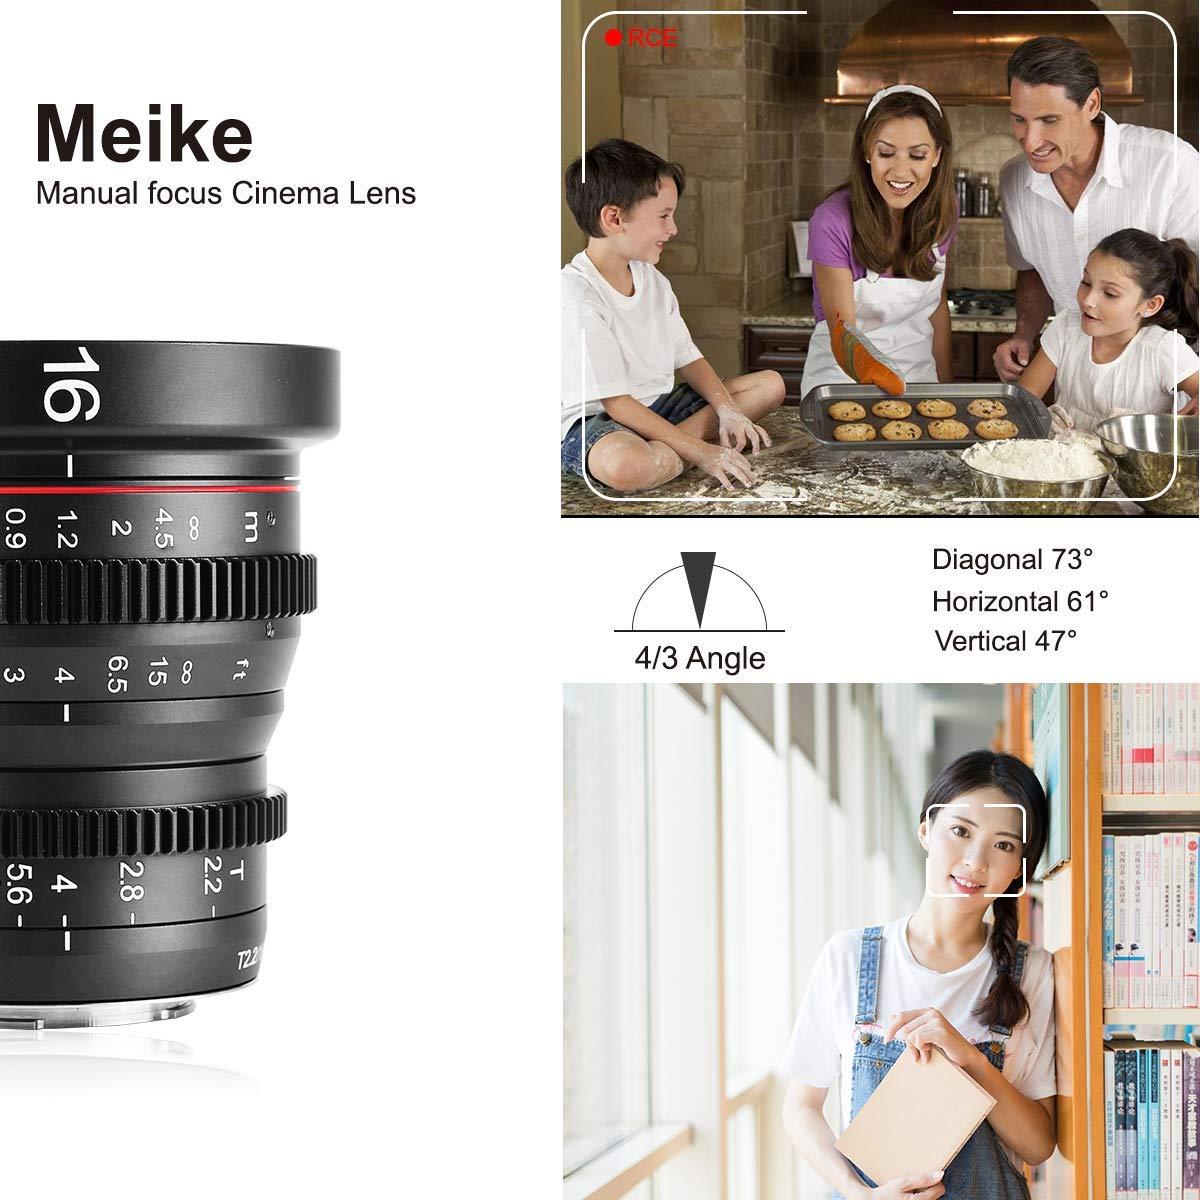 Meike MK-X1EM New Vertical Shoot Camera L type metal Bracket Hand Grip Holder for Sony A9 A7MIII A7RIII A7RII A7II A7SII Camera